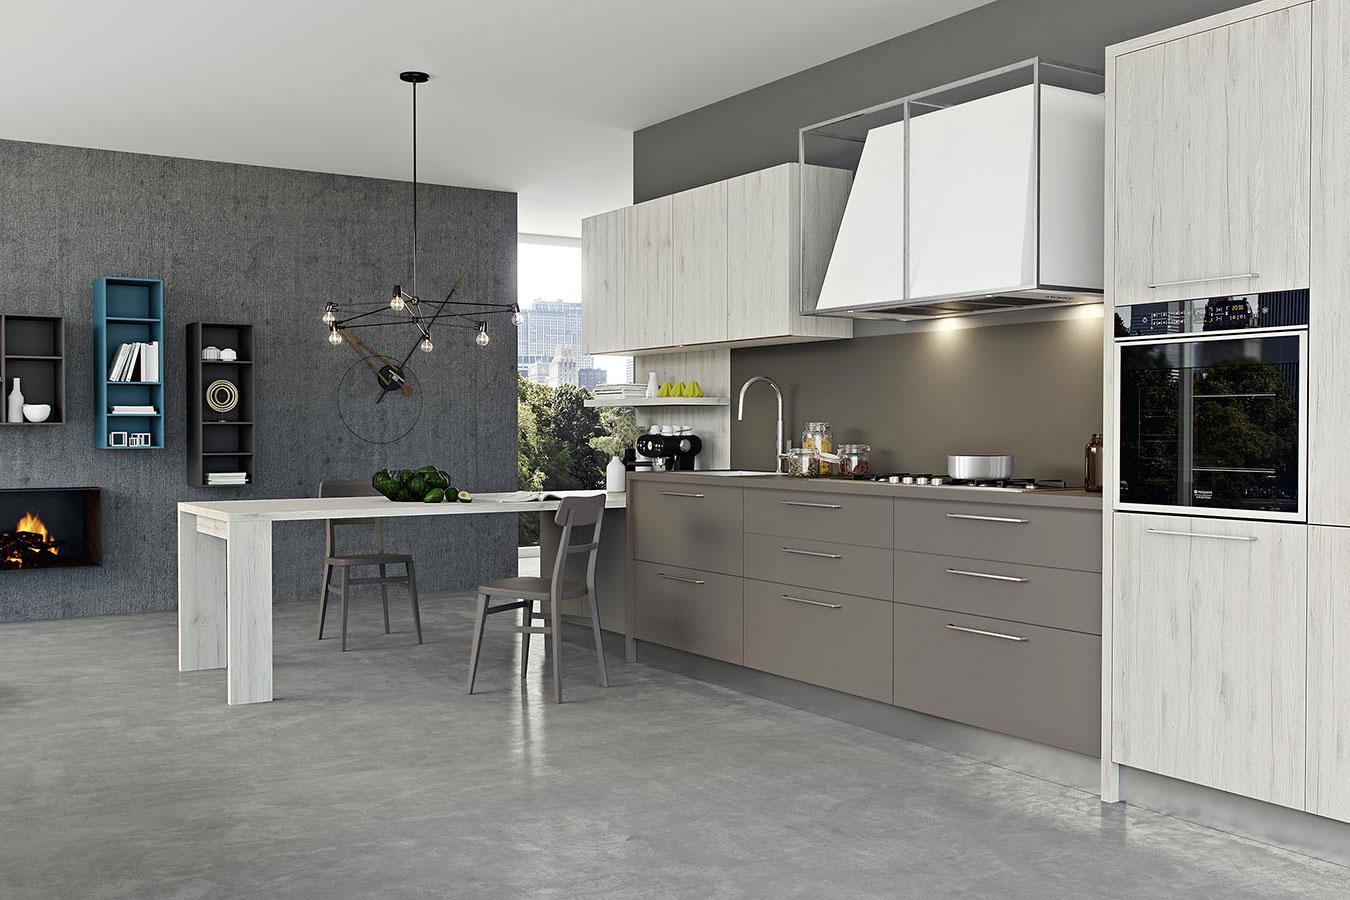 Cucina KALÌ di Arredo3 - Righetti Mobili Novara